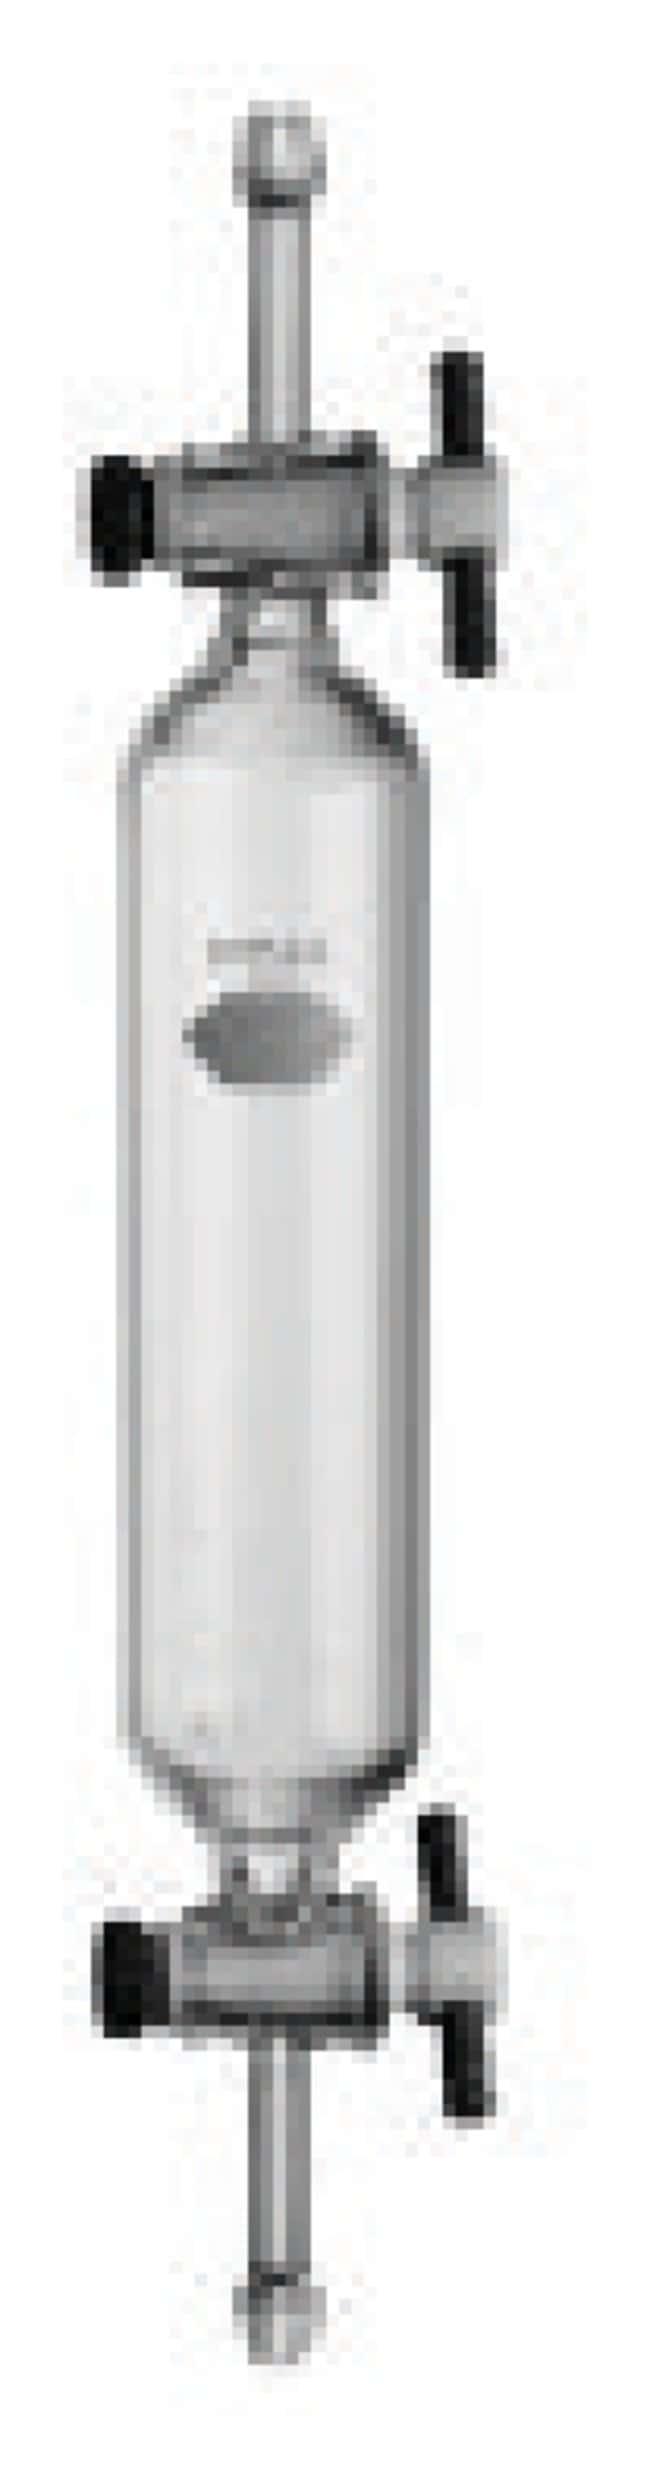 DWK Life Sciences Kimble Kontes Gas Sampling Tube with PTFE Lubriflo Stopcocks